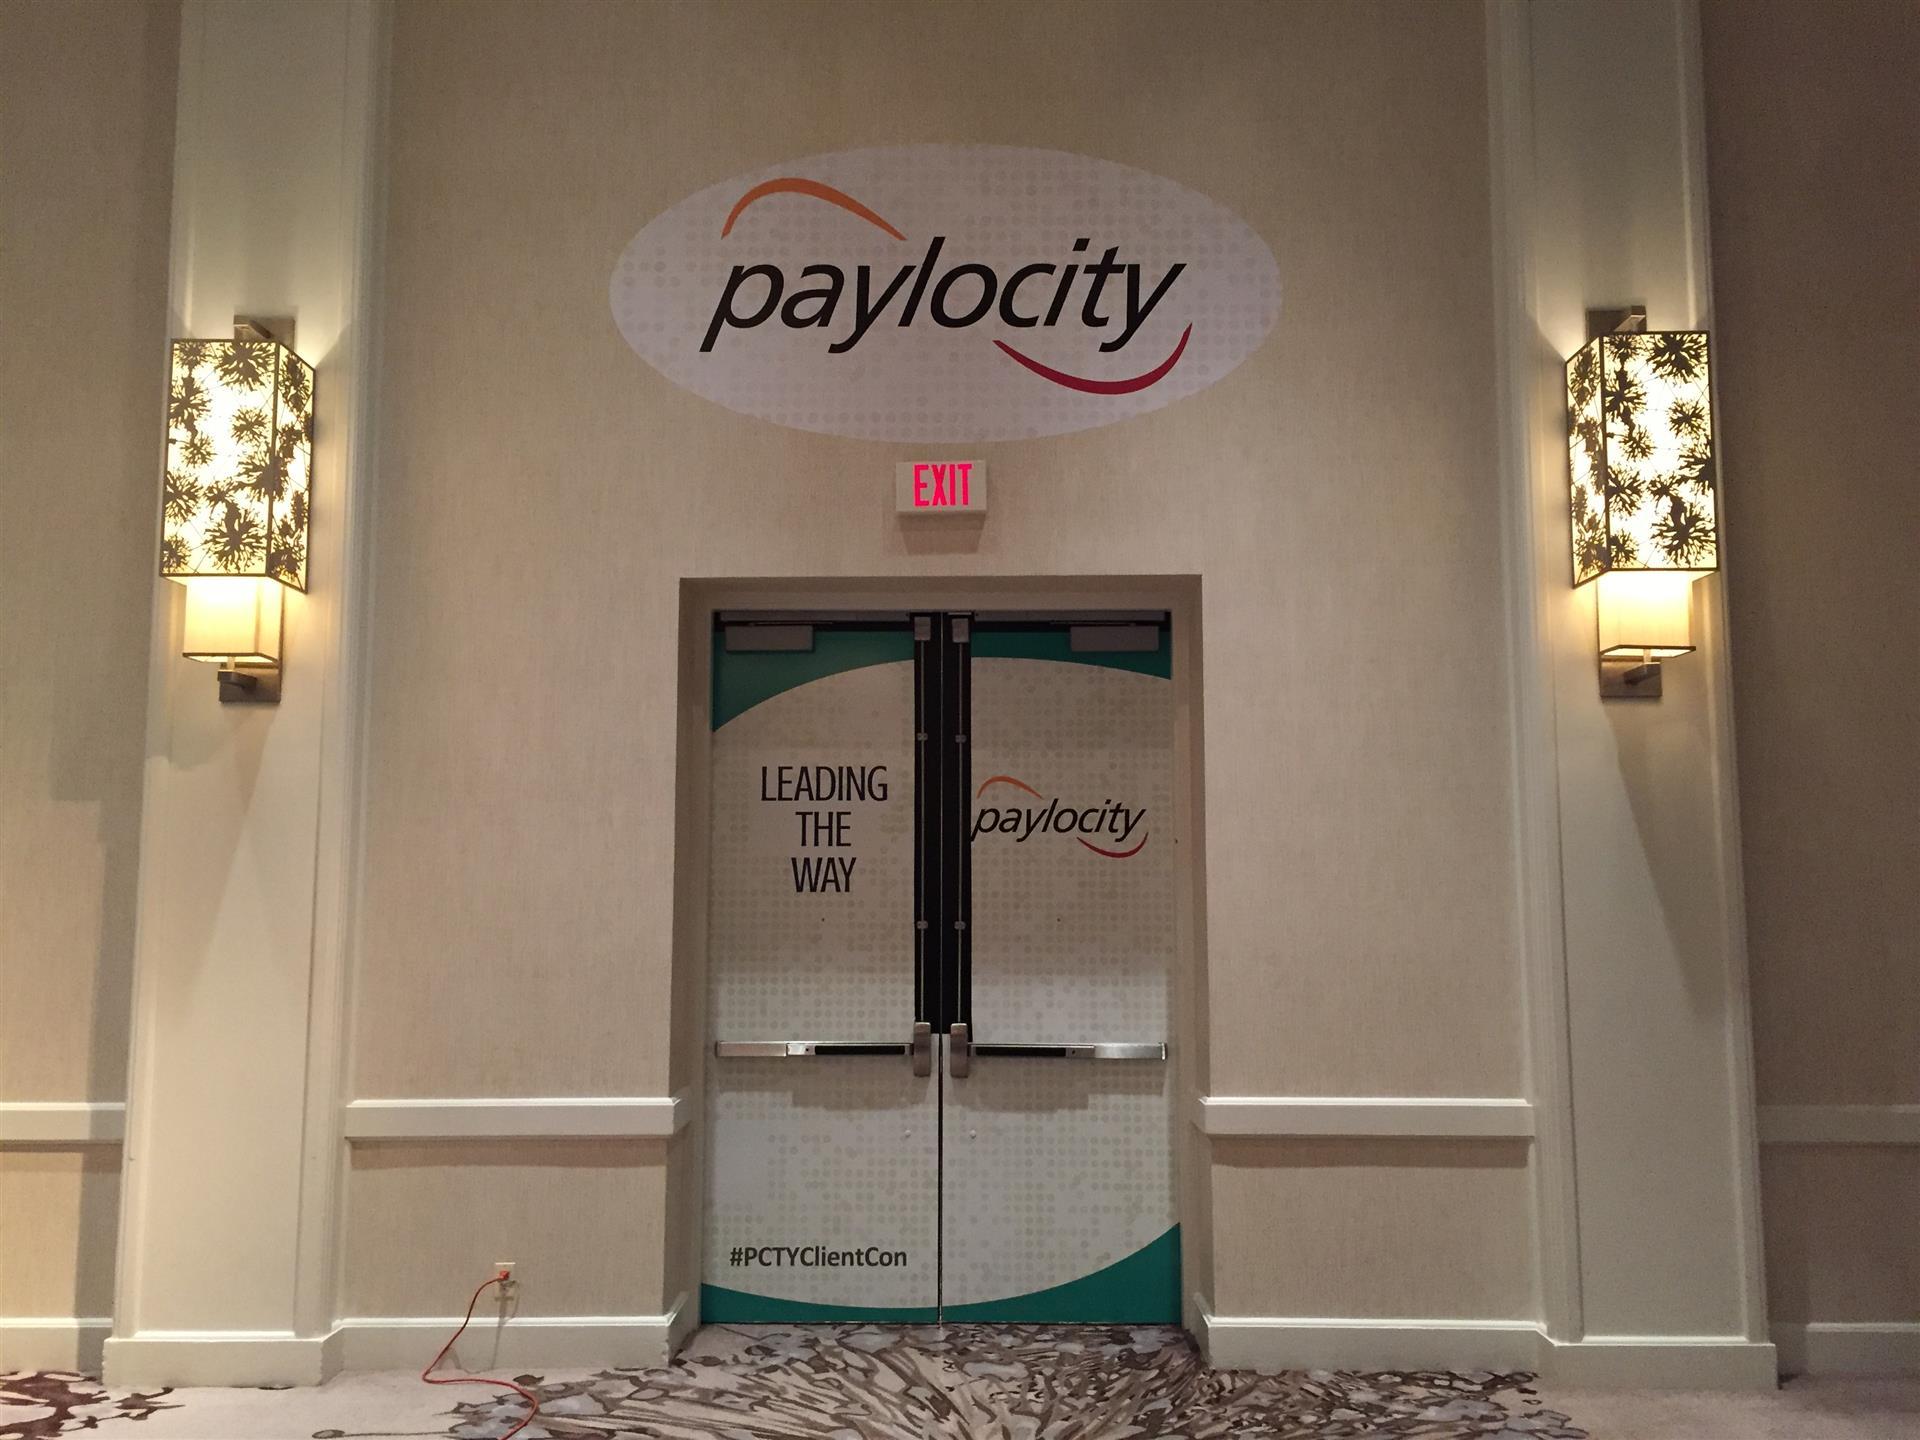 Paylocity Door Signs